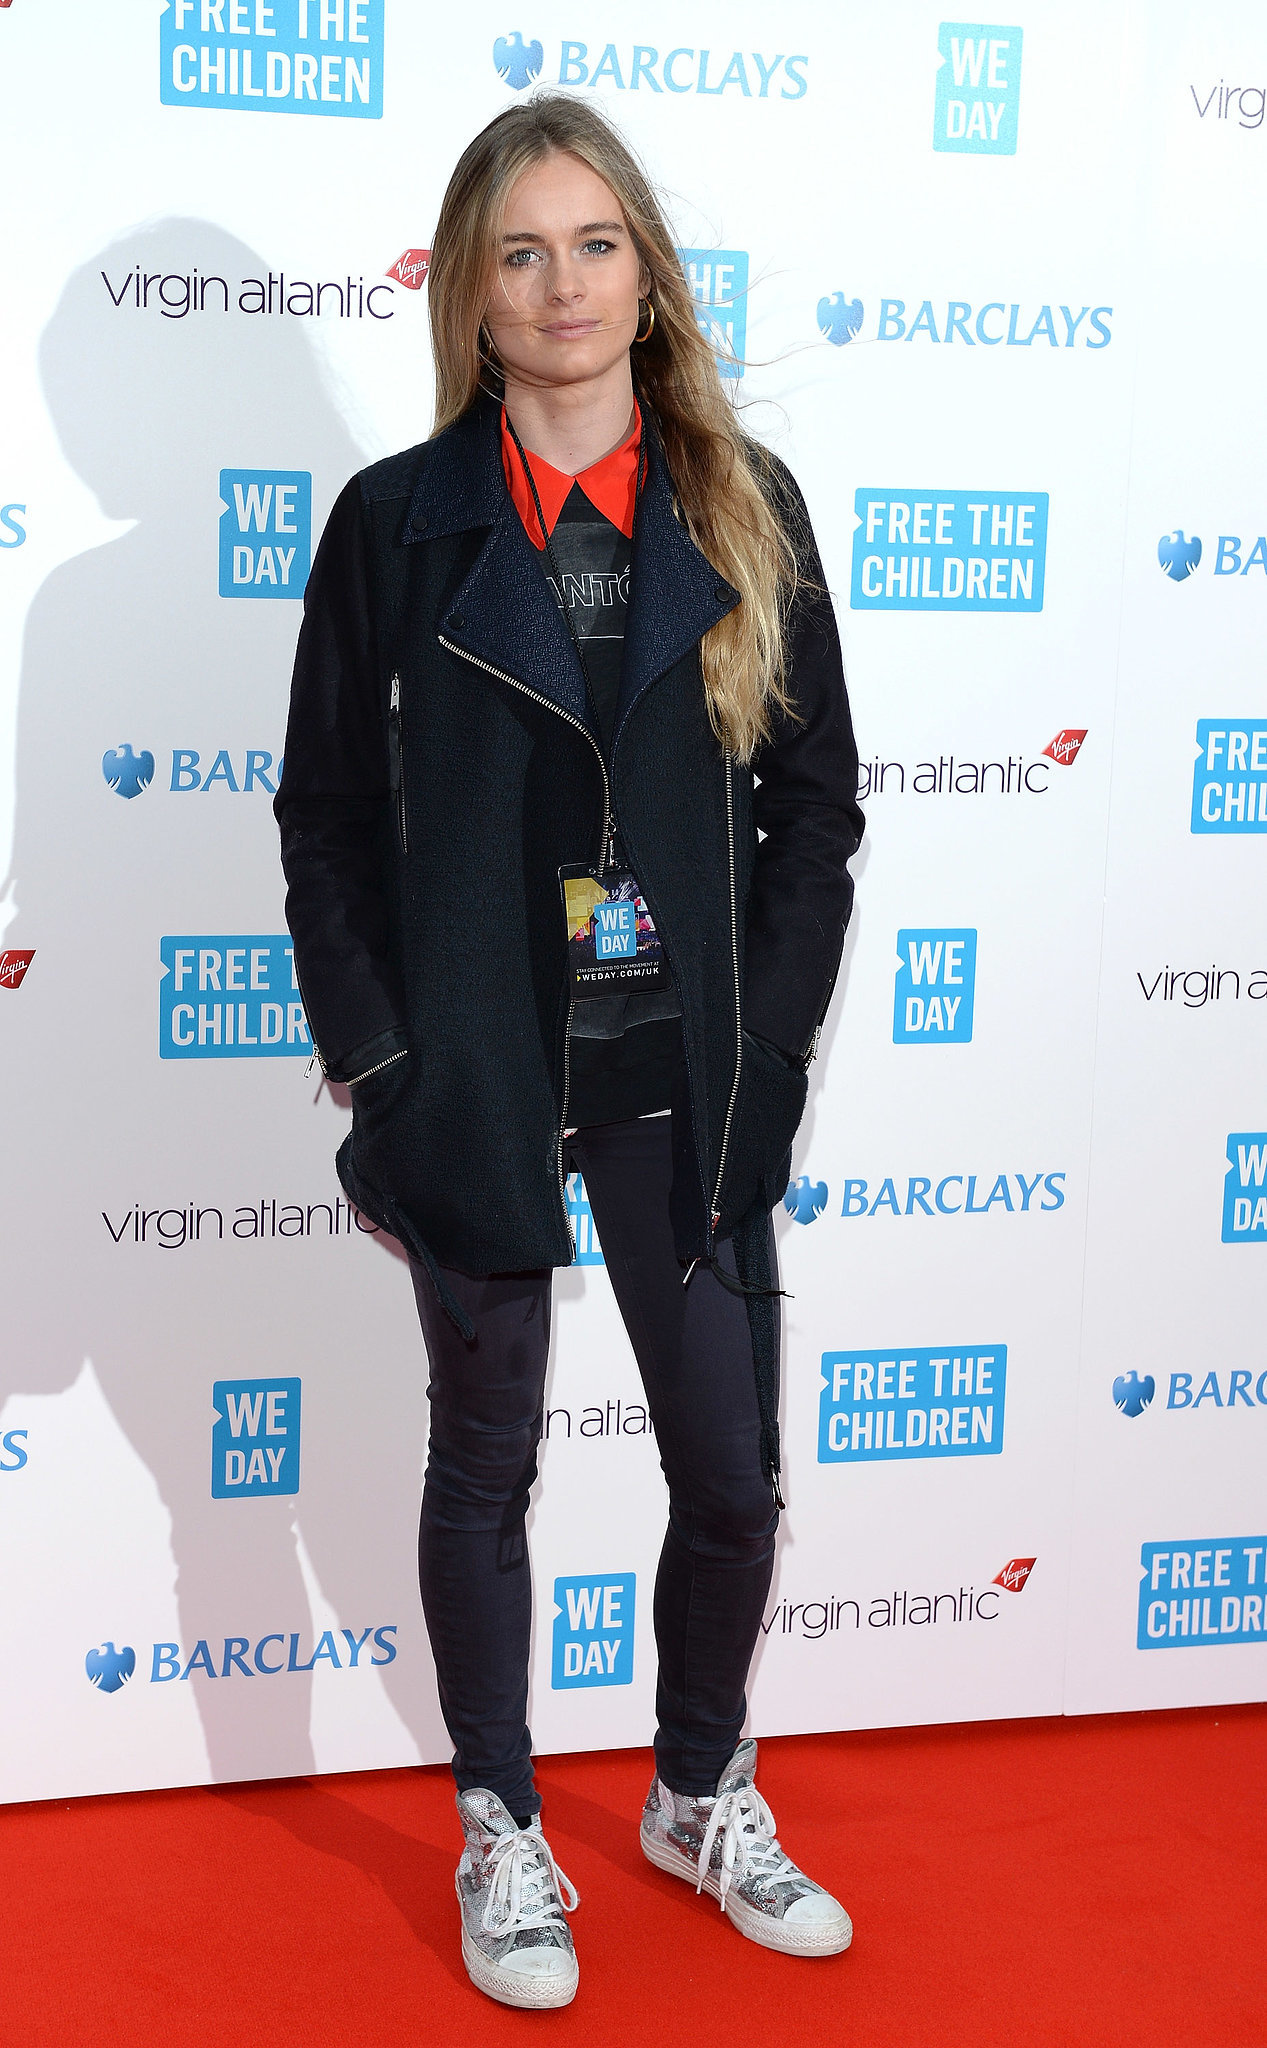 Cressida Bonas at the We Day UK Event